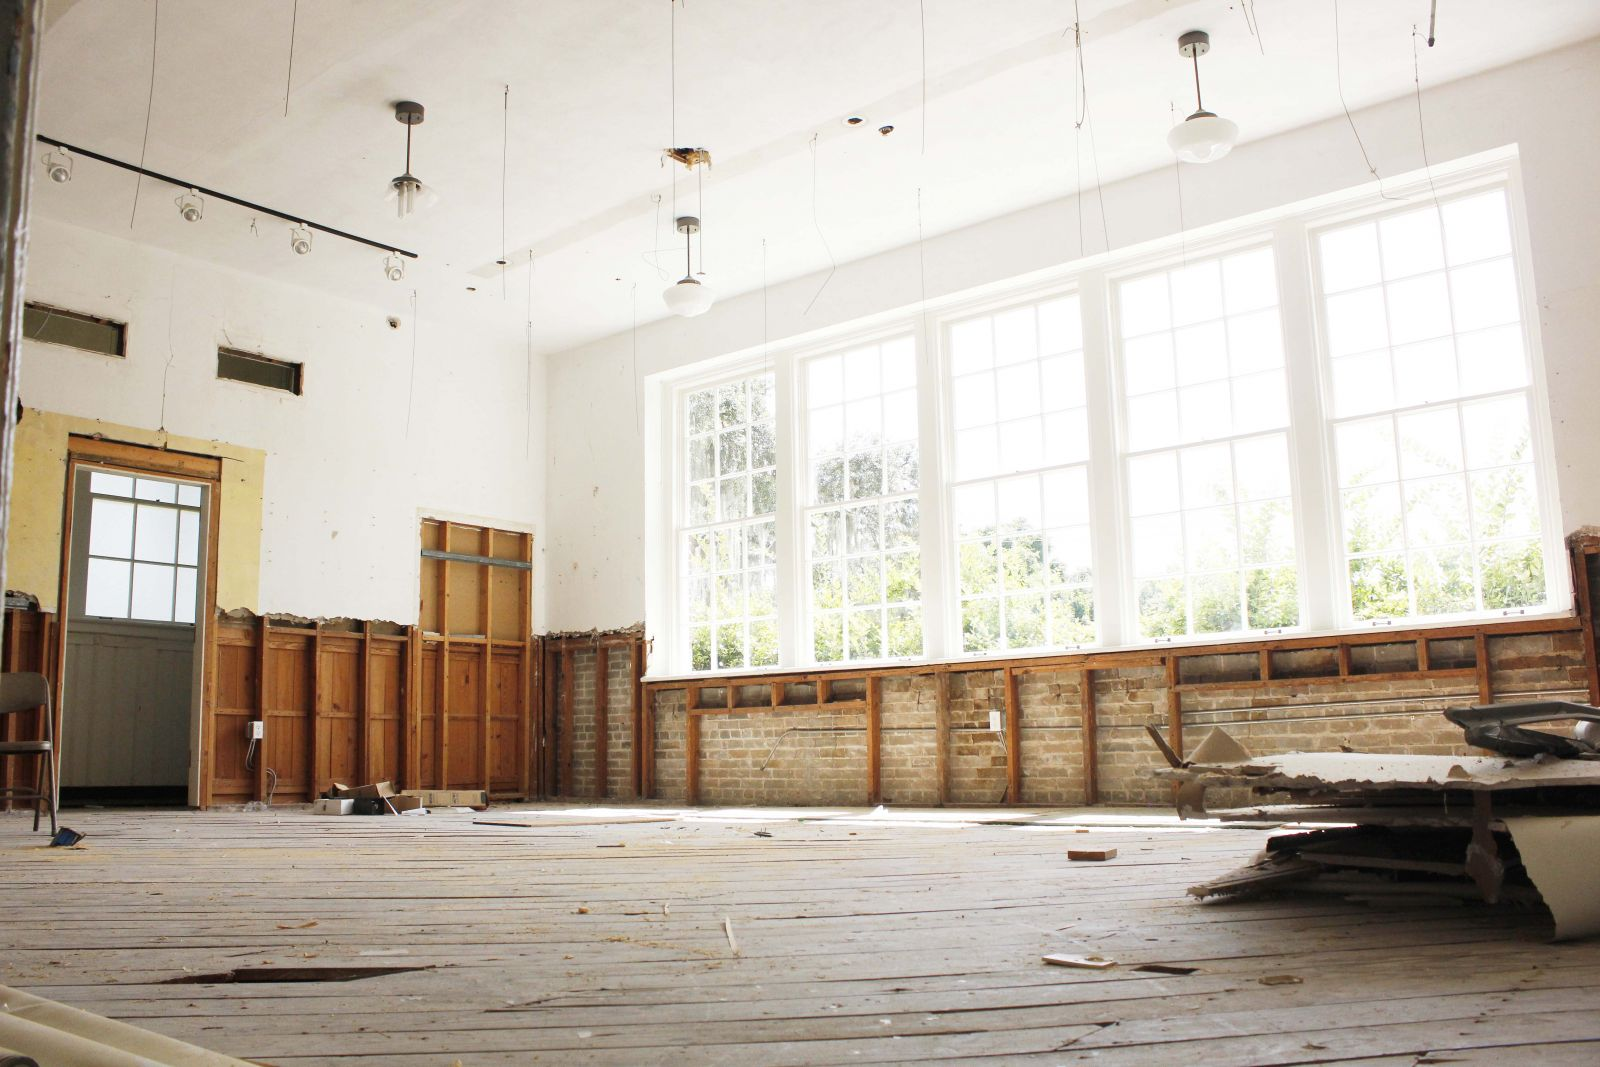 A former classroom